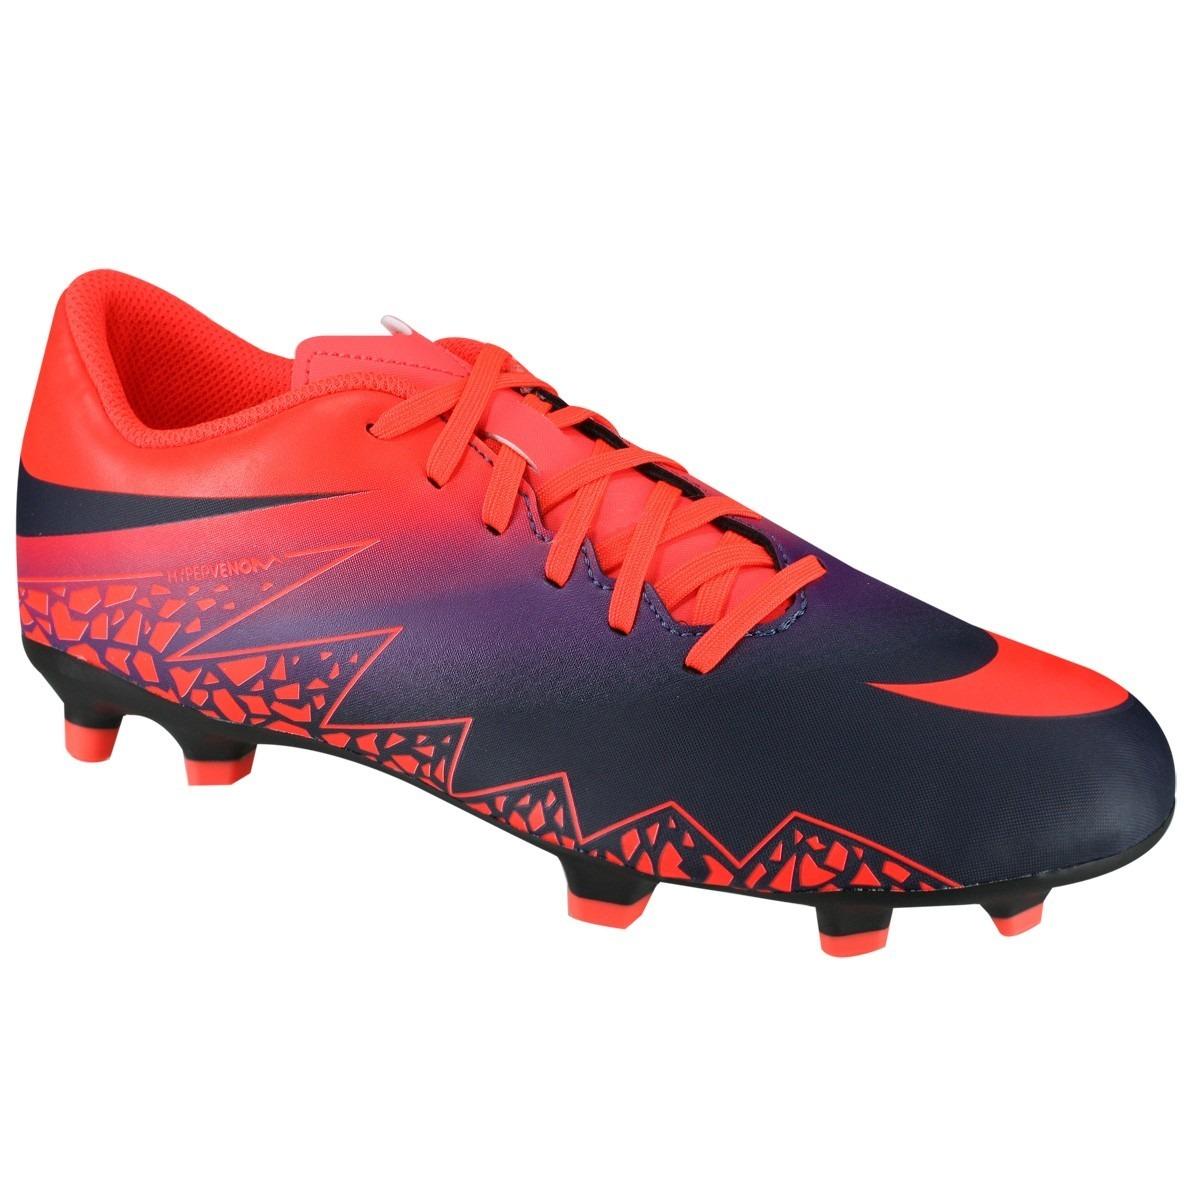 Chuteira Nike Hypervenom Phade 2 Ii Fg Campo Laranja Azul - R  200 ... e5f6c7b5fcd6c